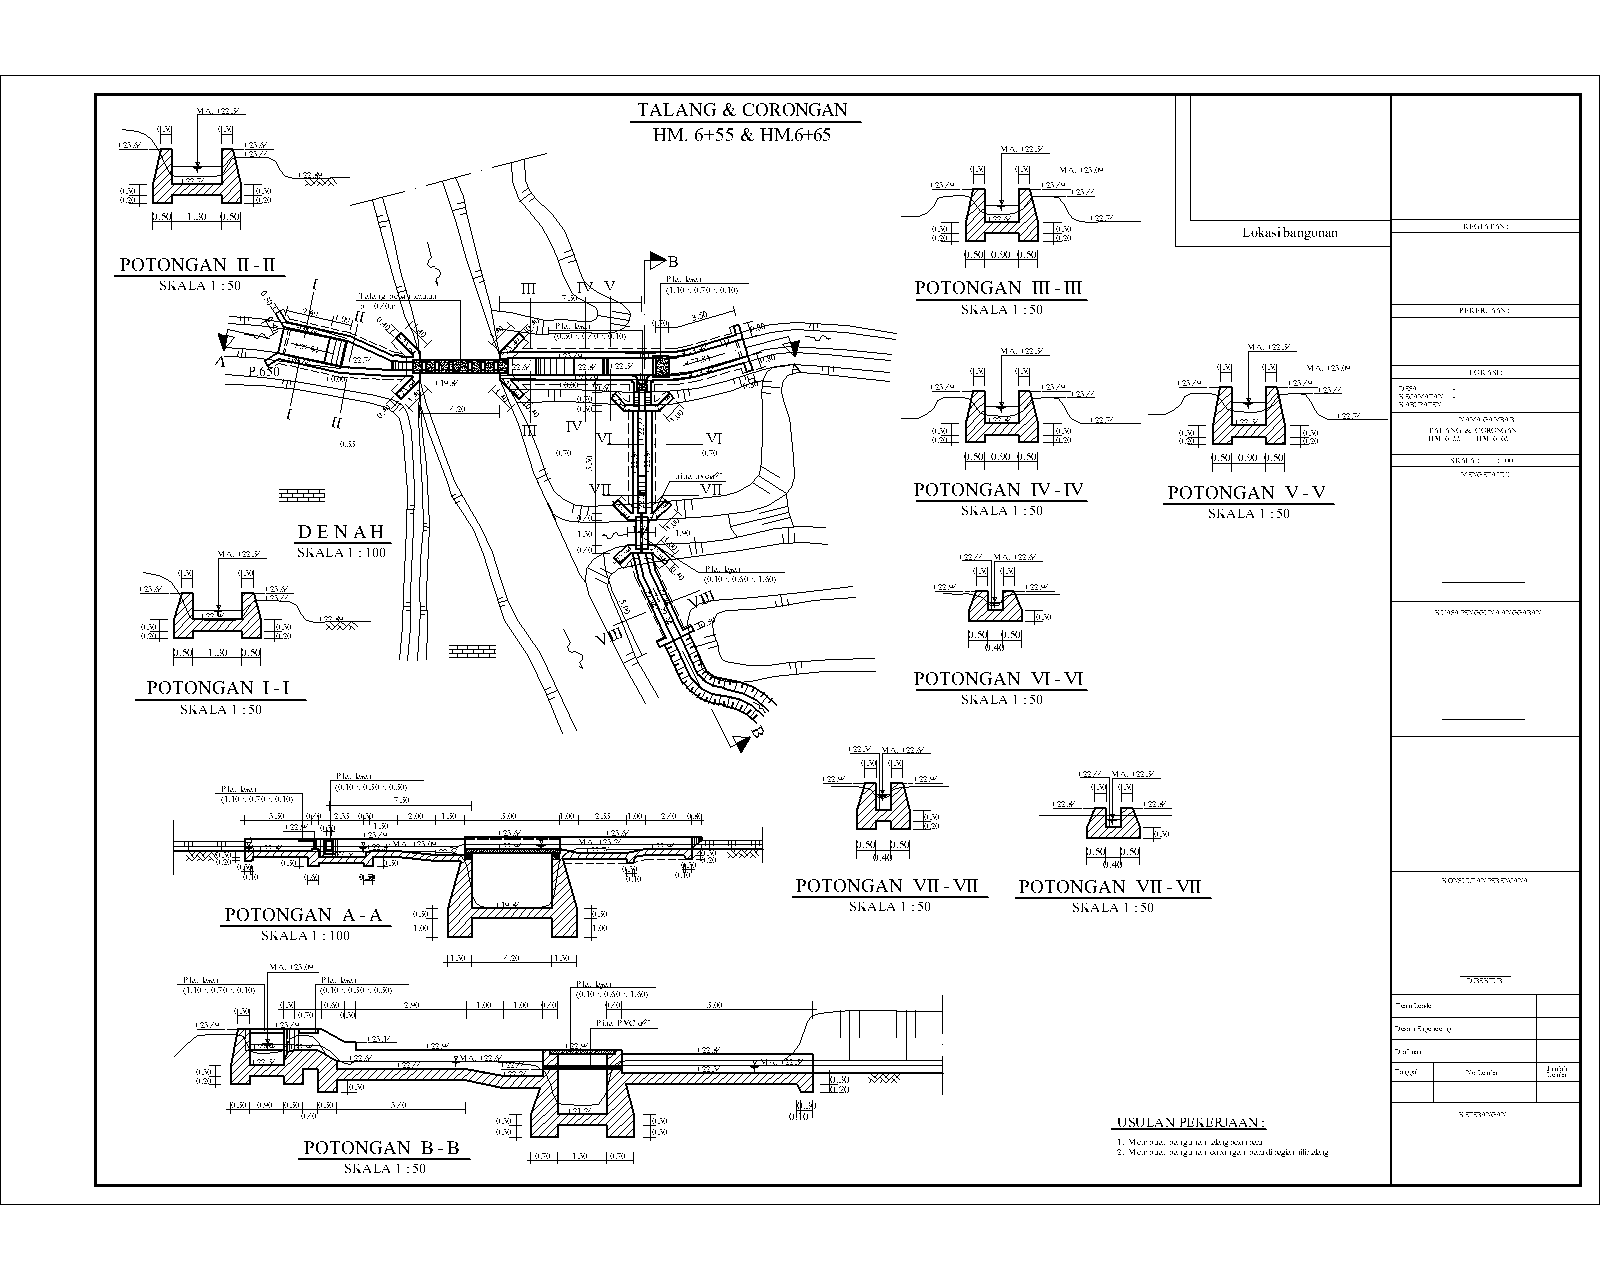 RANCANG GRIYA: Contoh Gambar Desain Bangunan Air